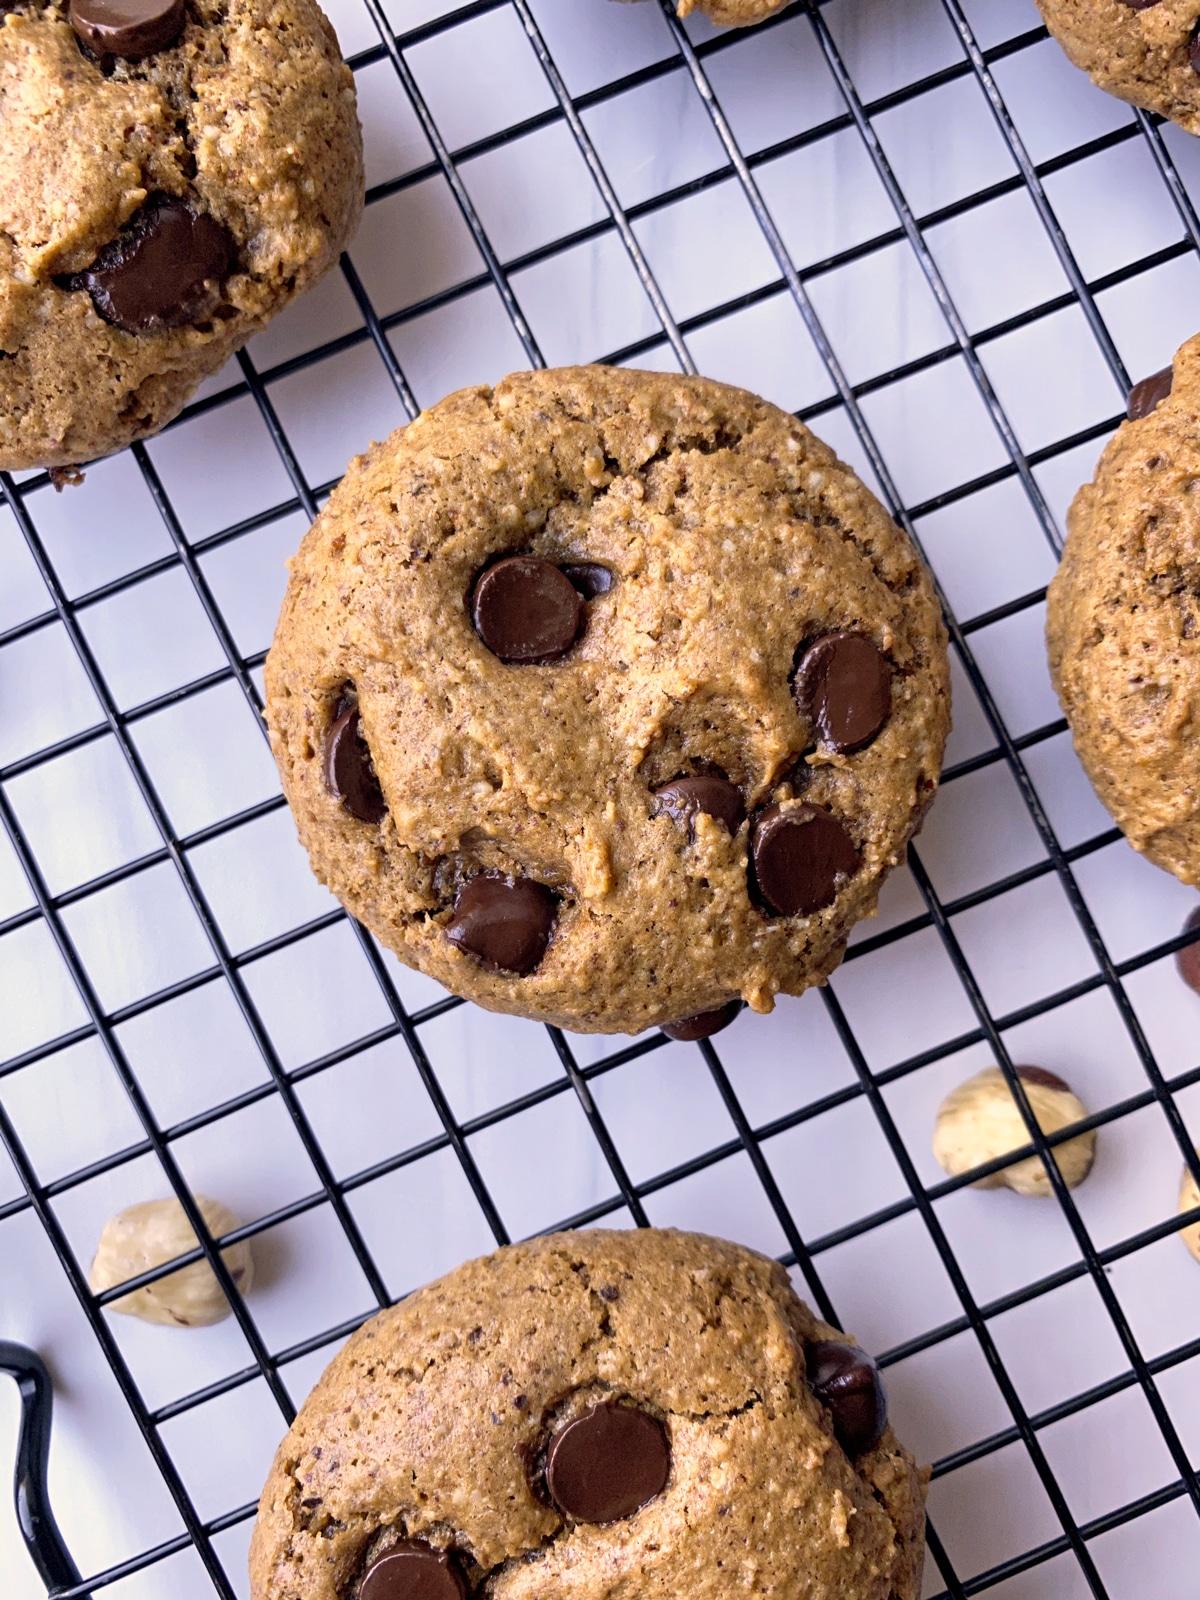 paleo and keto cookies made with hazelnut flour